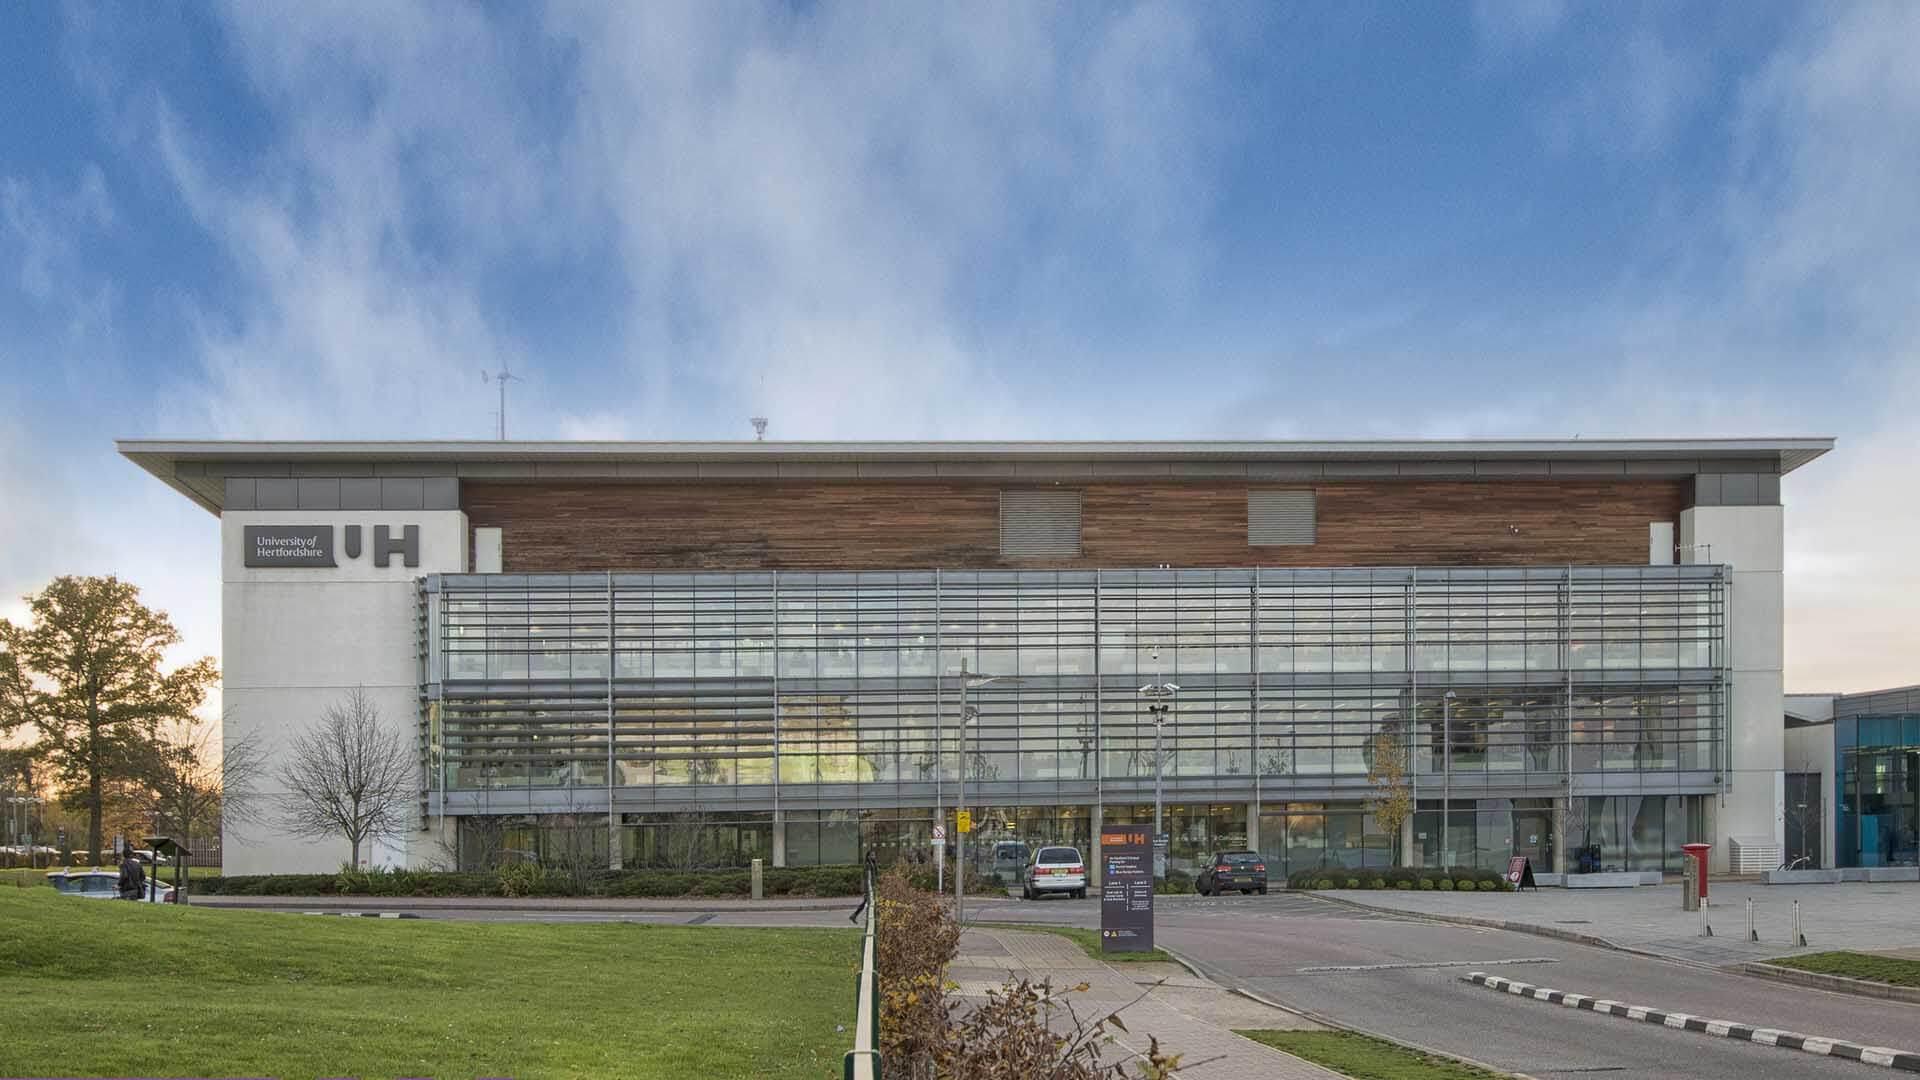 UH_ACFTechnologies_english_University_of_Hertfordshire_Customer_Service_Center_Management_qs_2019_03